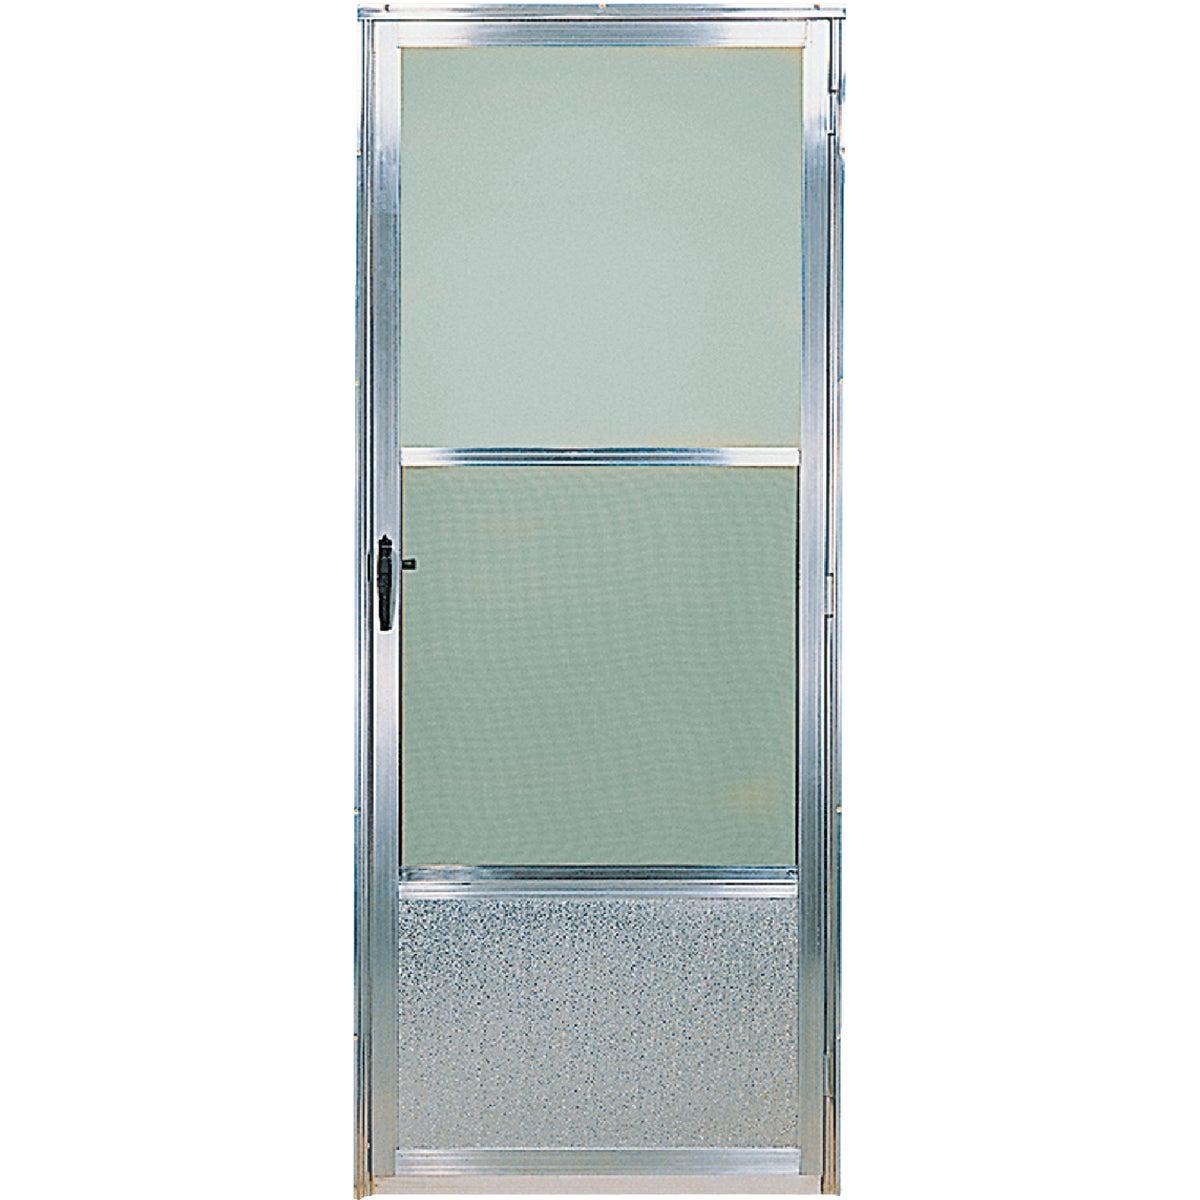 161 2668 RH MILL DOOR